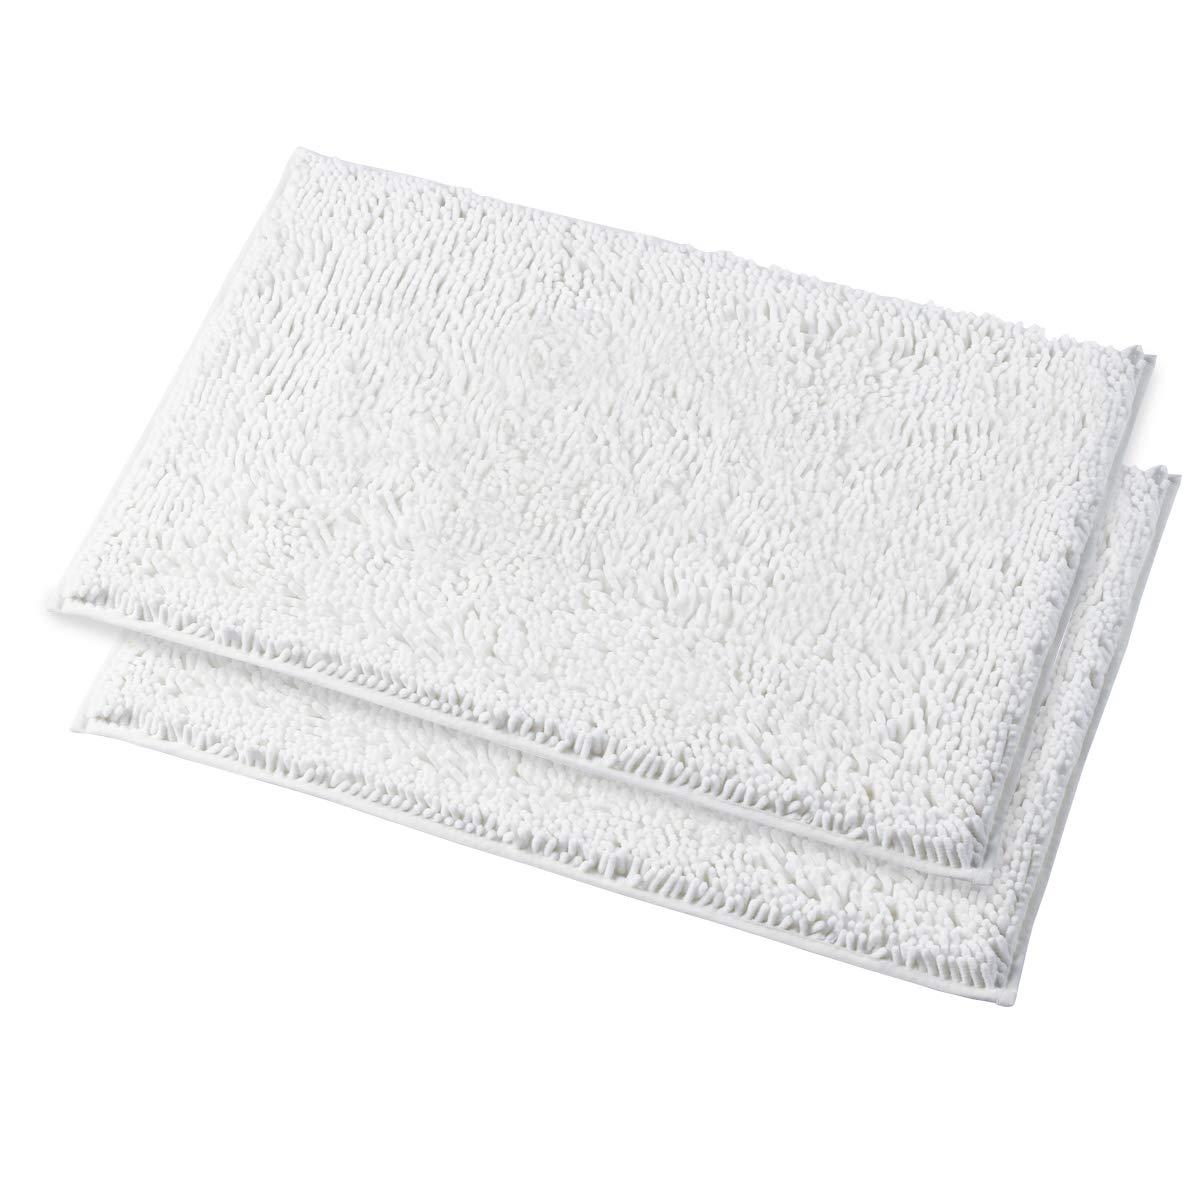 MAYSHINE Bath mats for Bathroom Rugs Non Slip Machine Washable Soft Microfiber 2 Pack (20×32 inches, White)